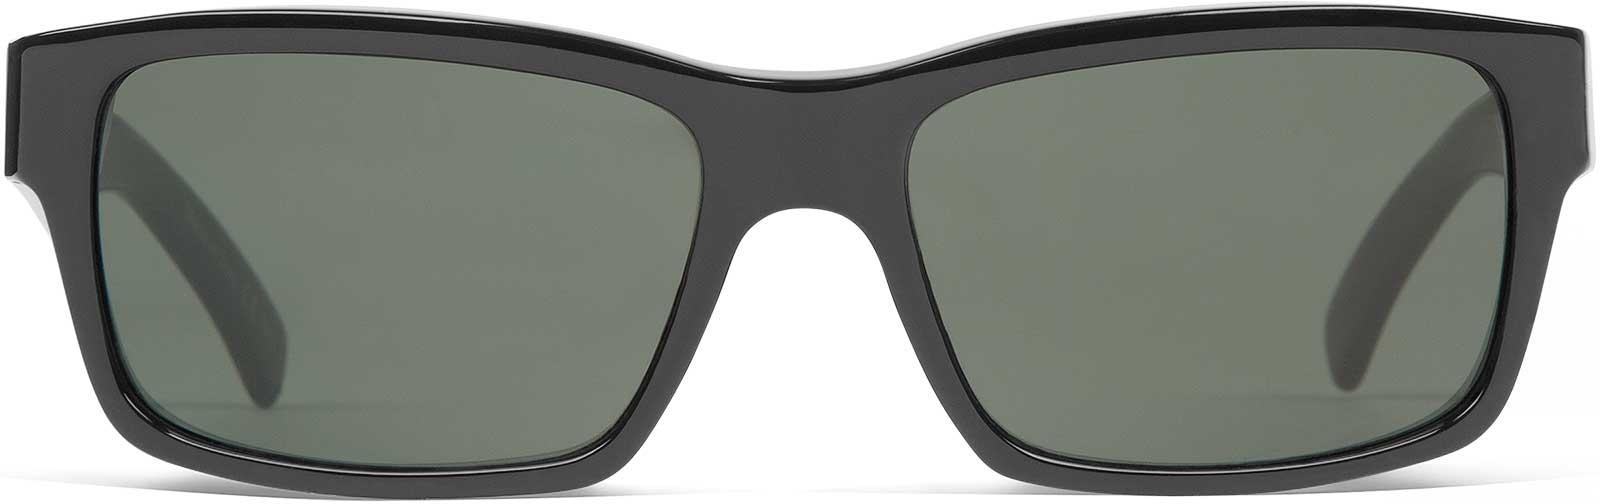 New VONZIPPER Sunglasses VZ FULTON Black Frames with Polarized Grey Lenses